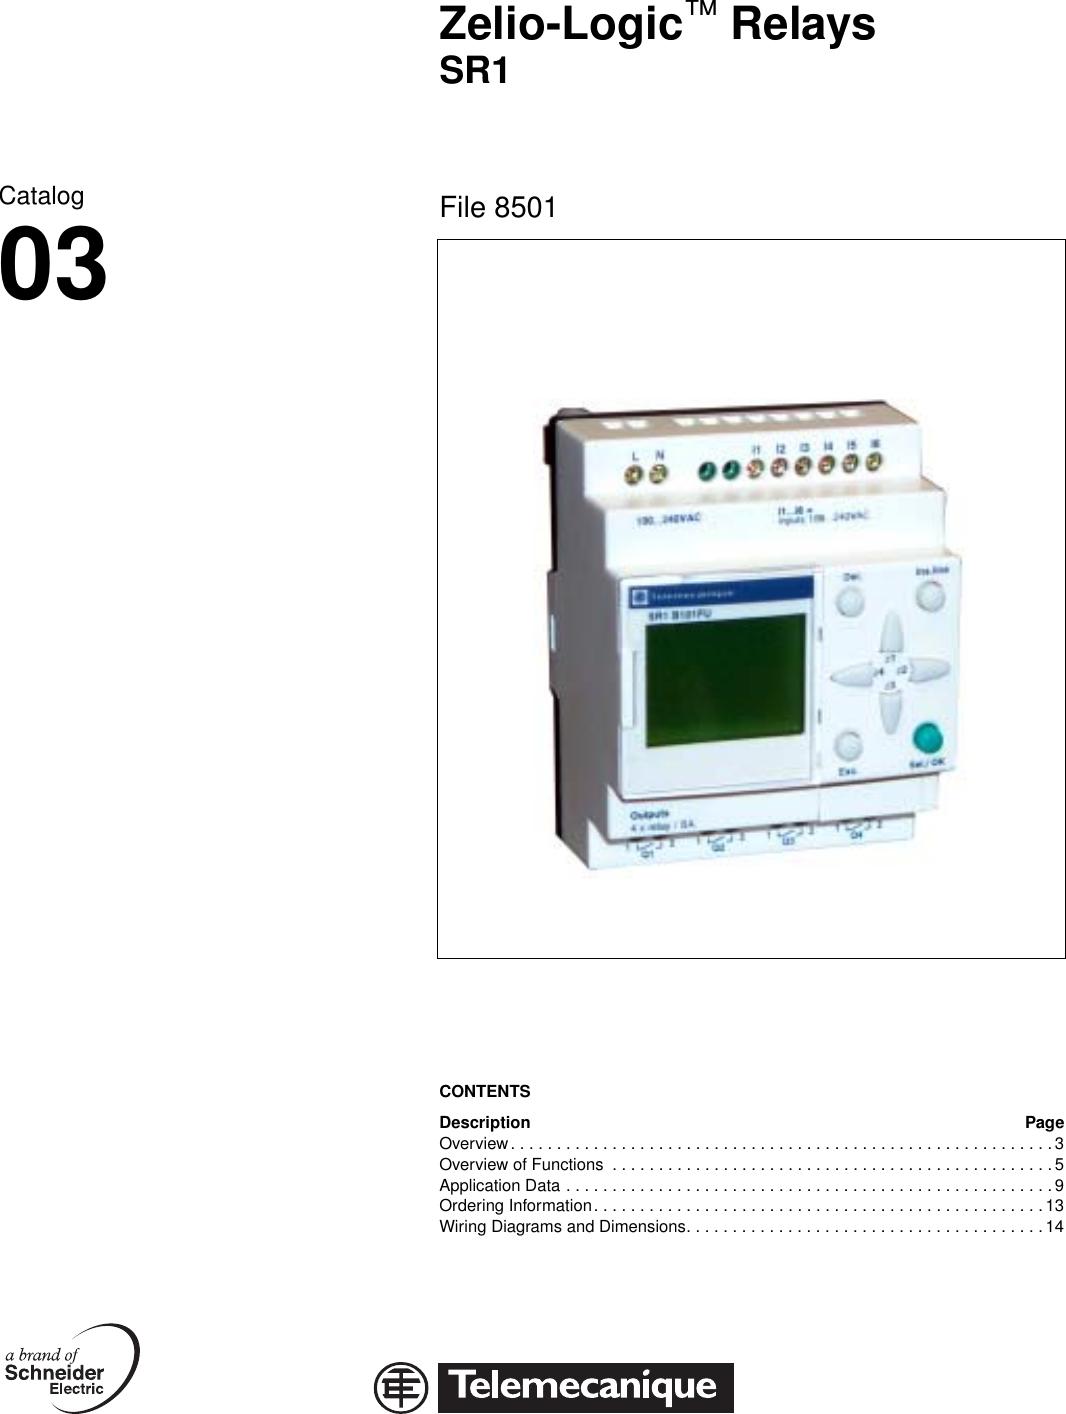 Zelio Logic Relays Sr1 Brochure Telemecanique Wiring Diagram